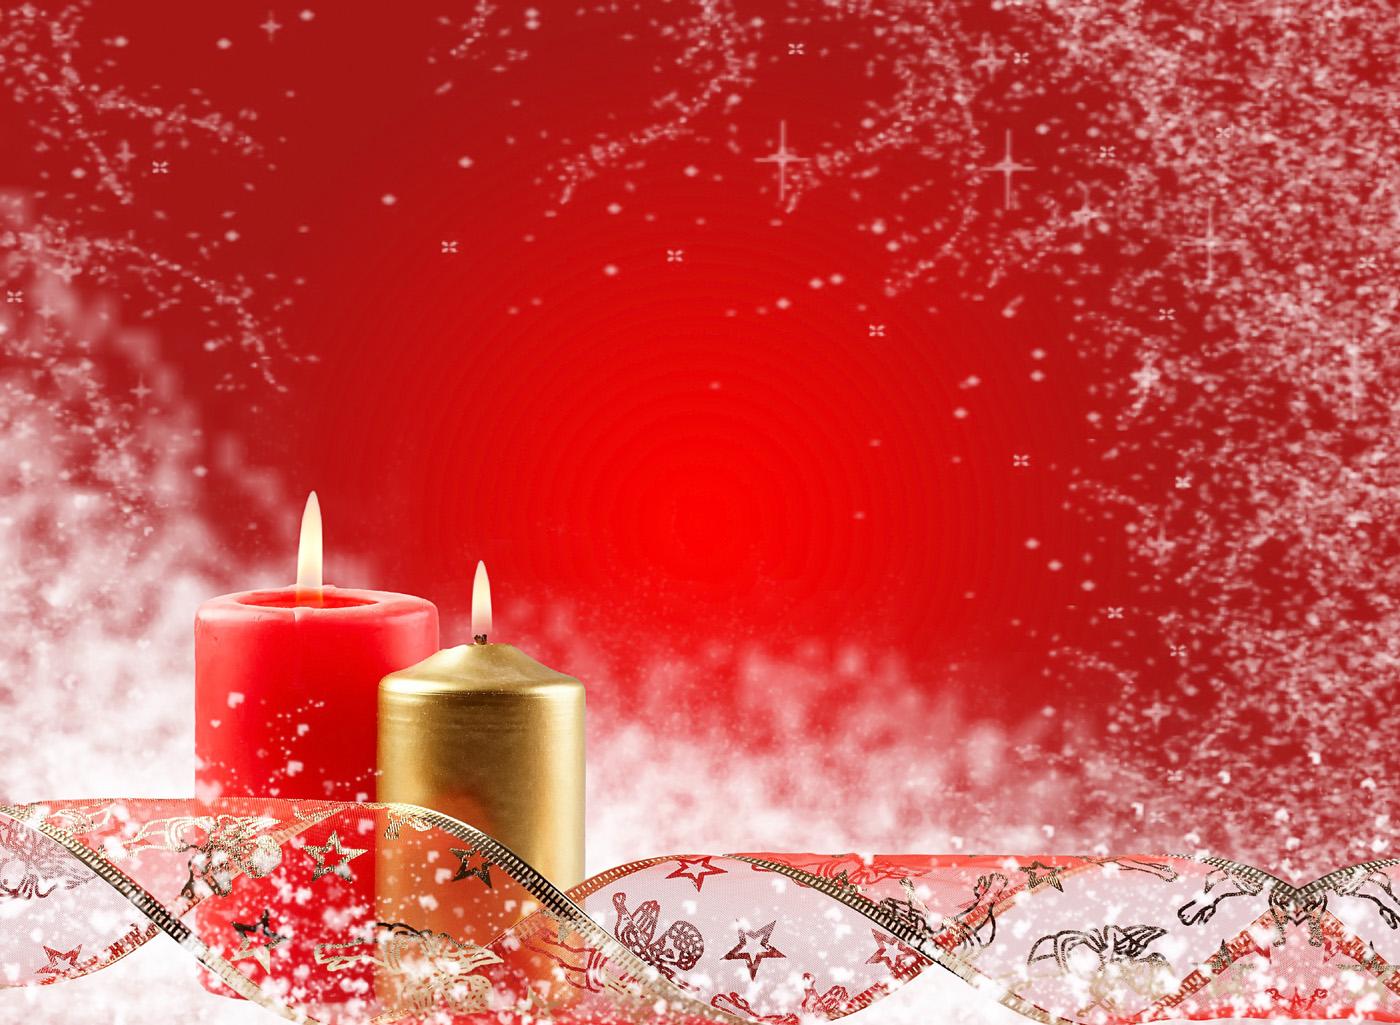 Christmas background 27809 - Christmas - Festival